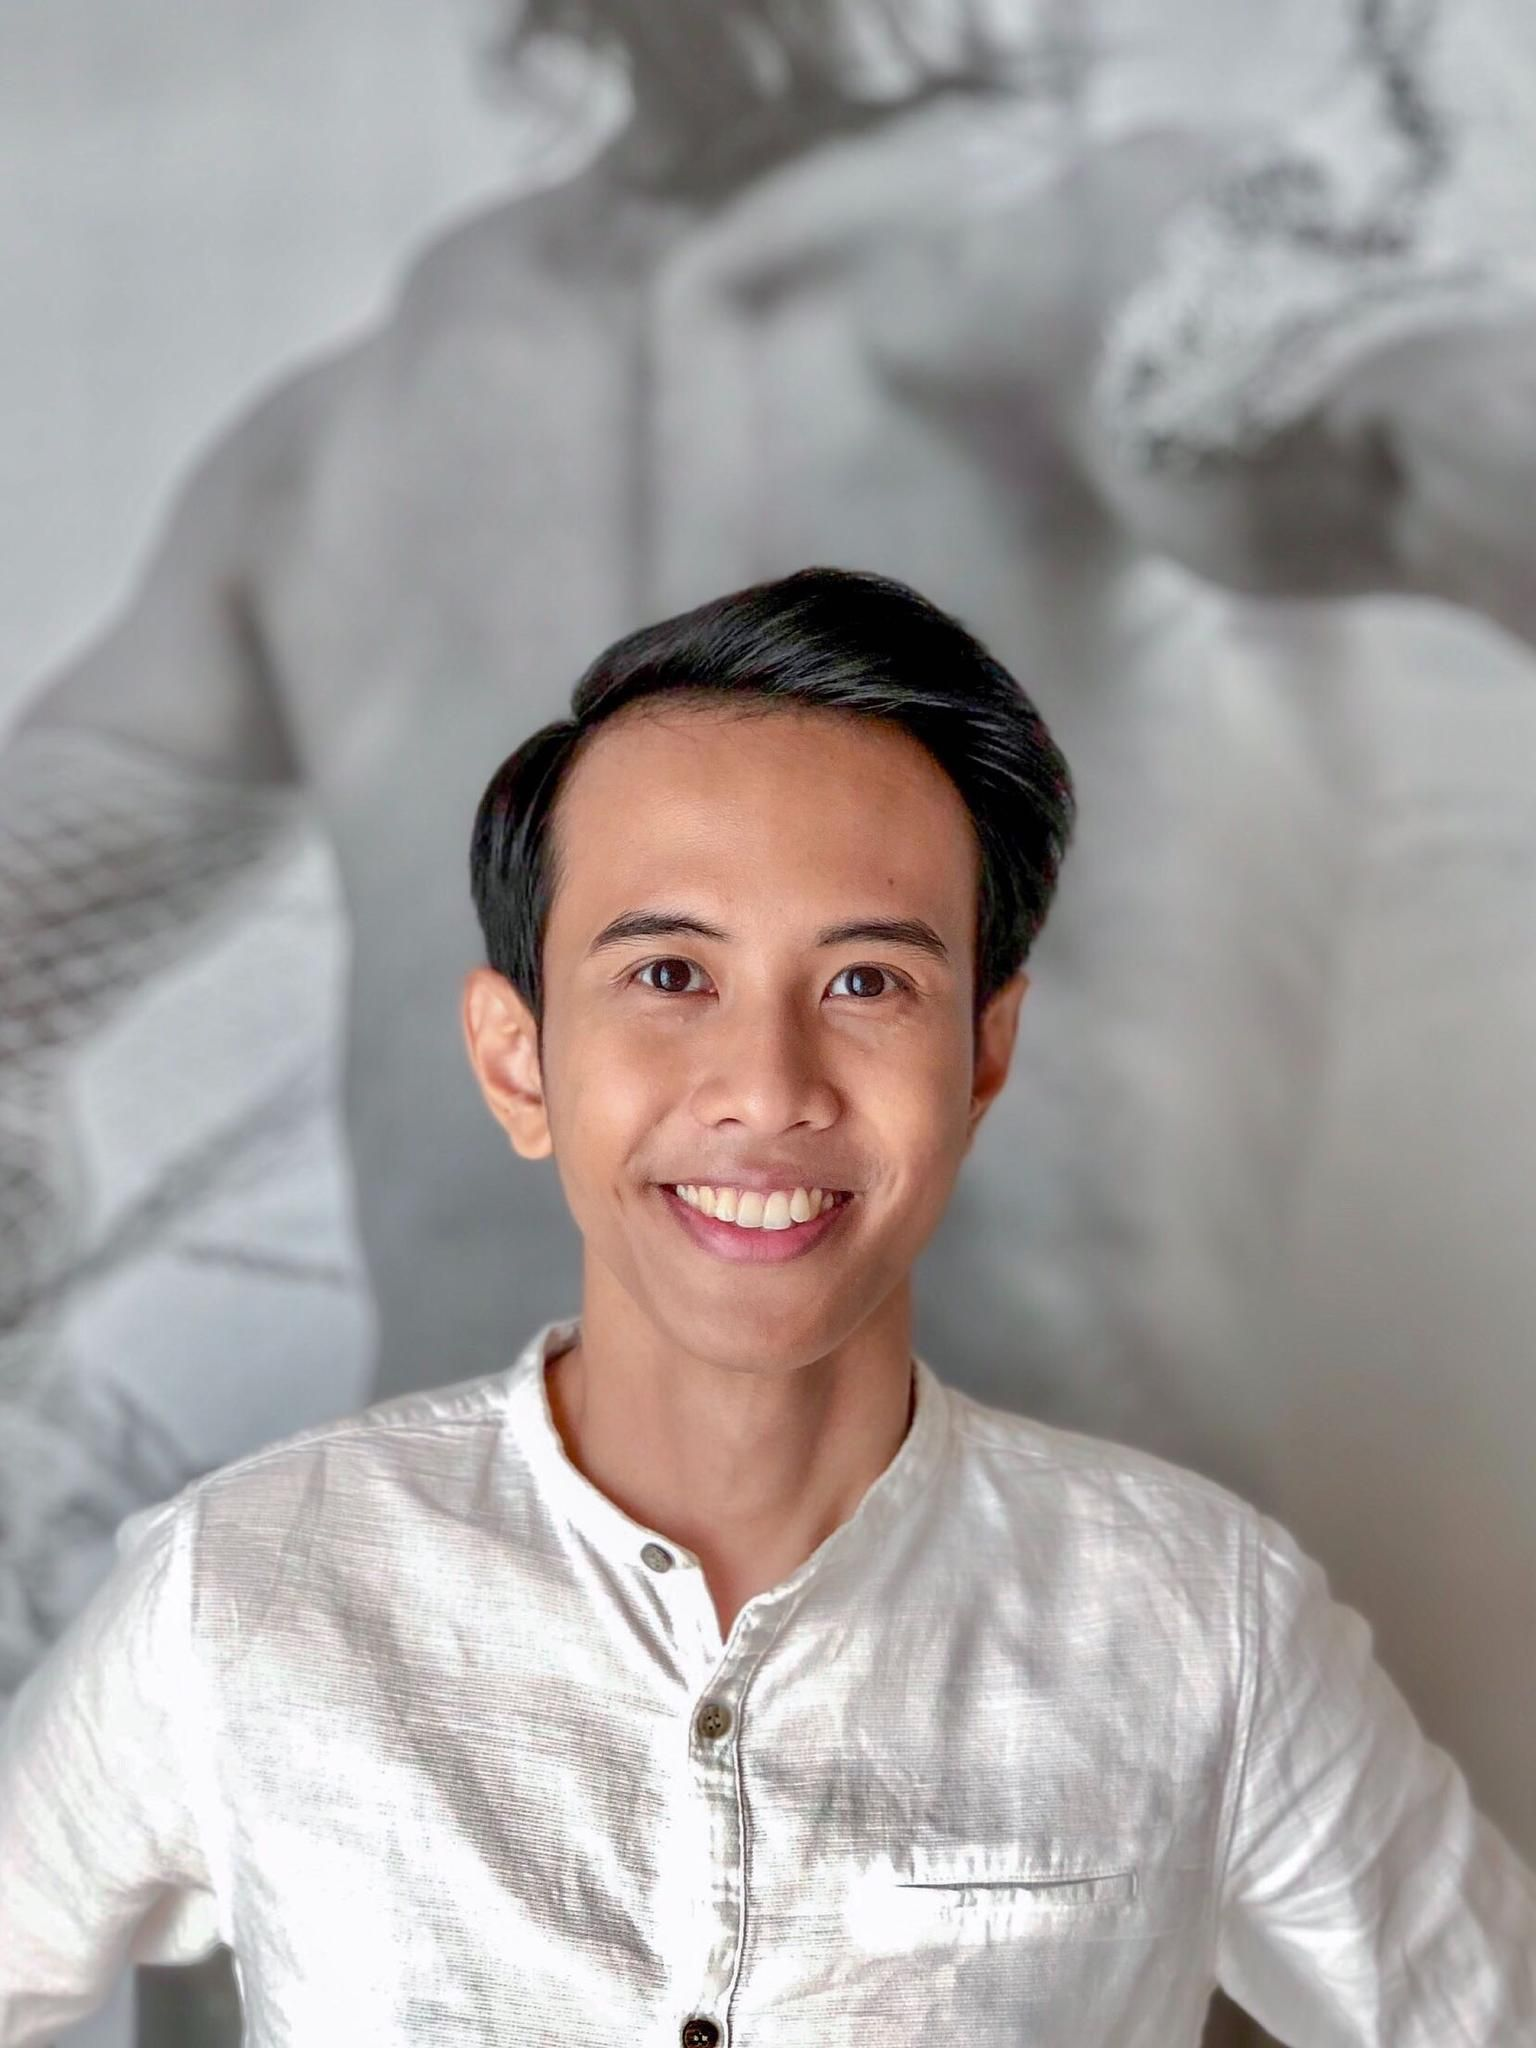 Rizal Wisnu Prasetya